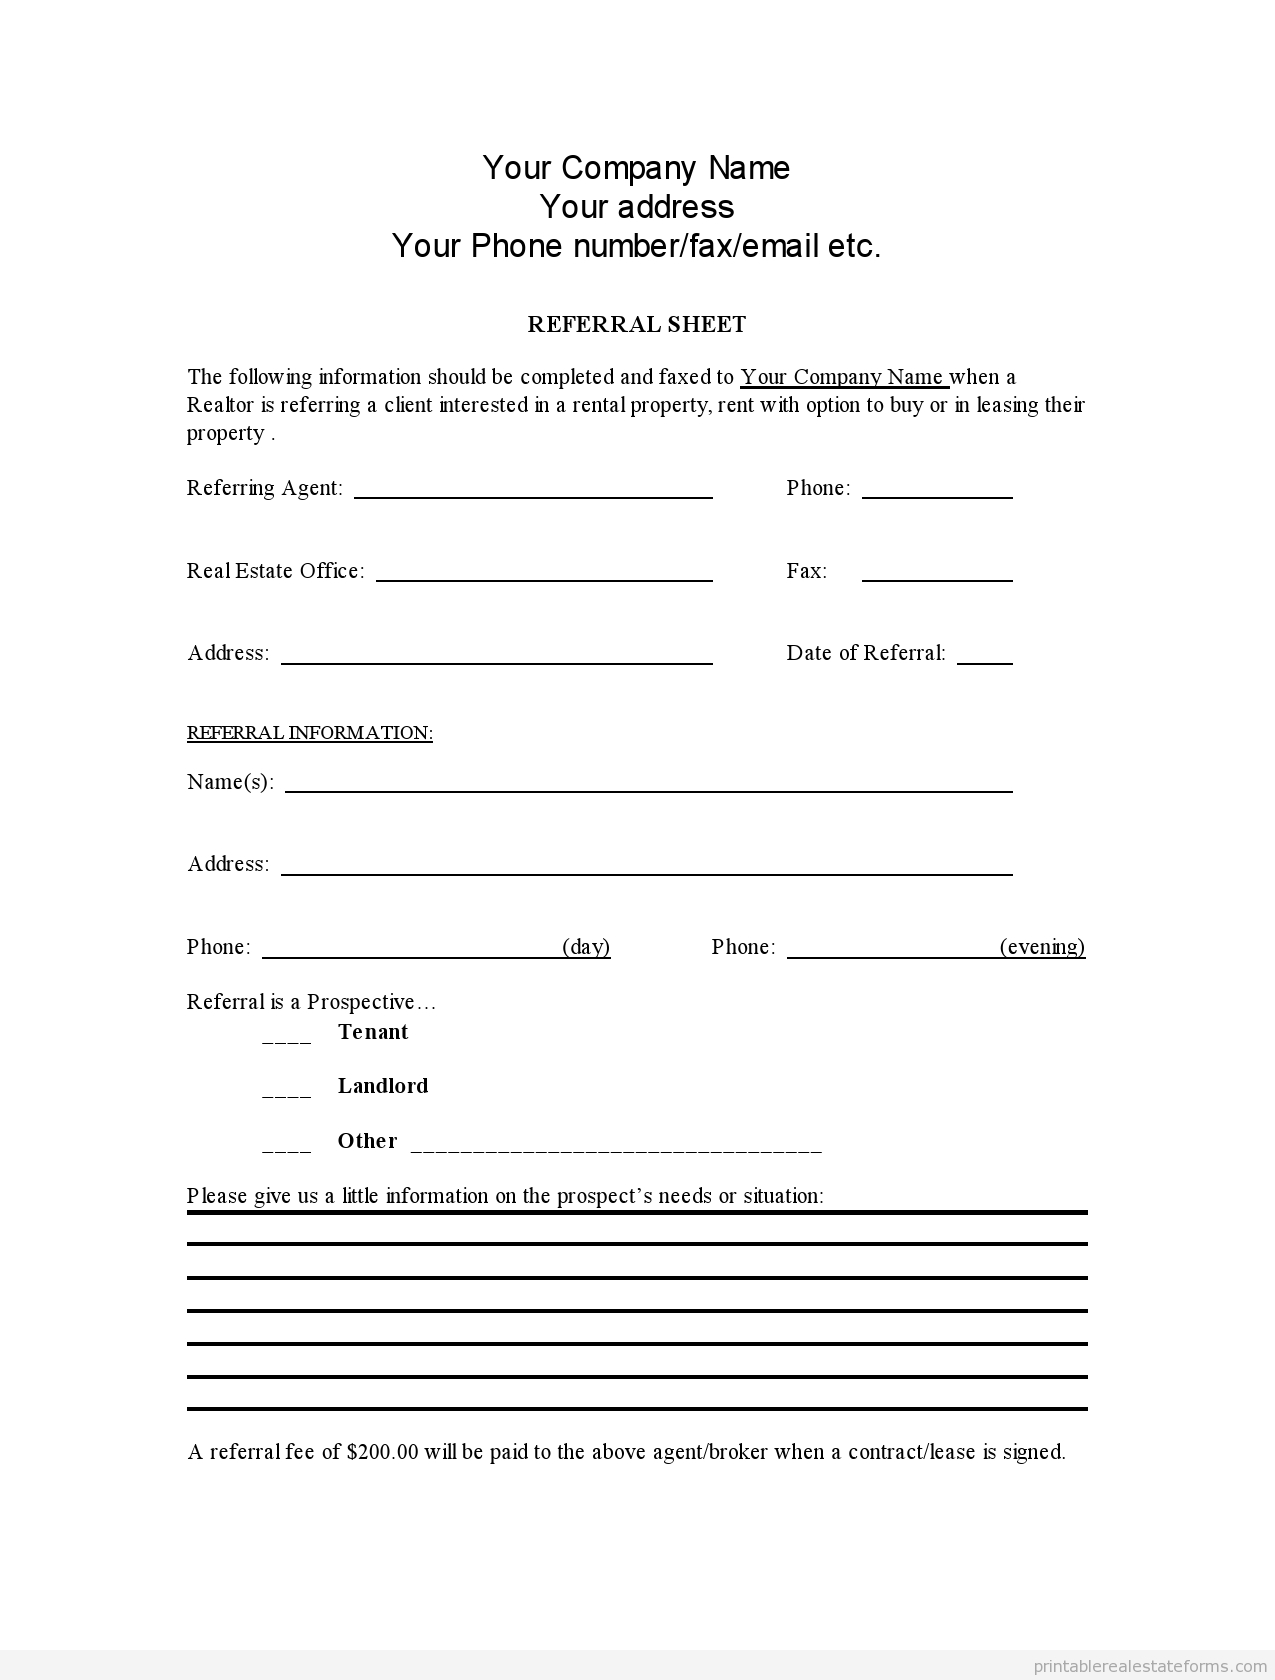 Sample Printable Referral Sheet For Realtors Form  Latest Sample Regarding Referral Certificate Template